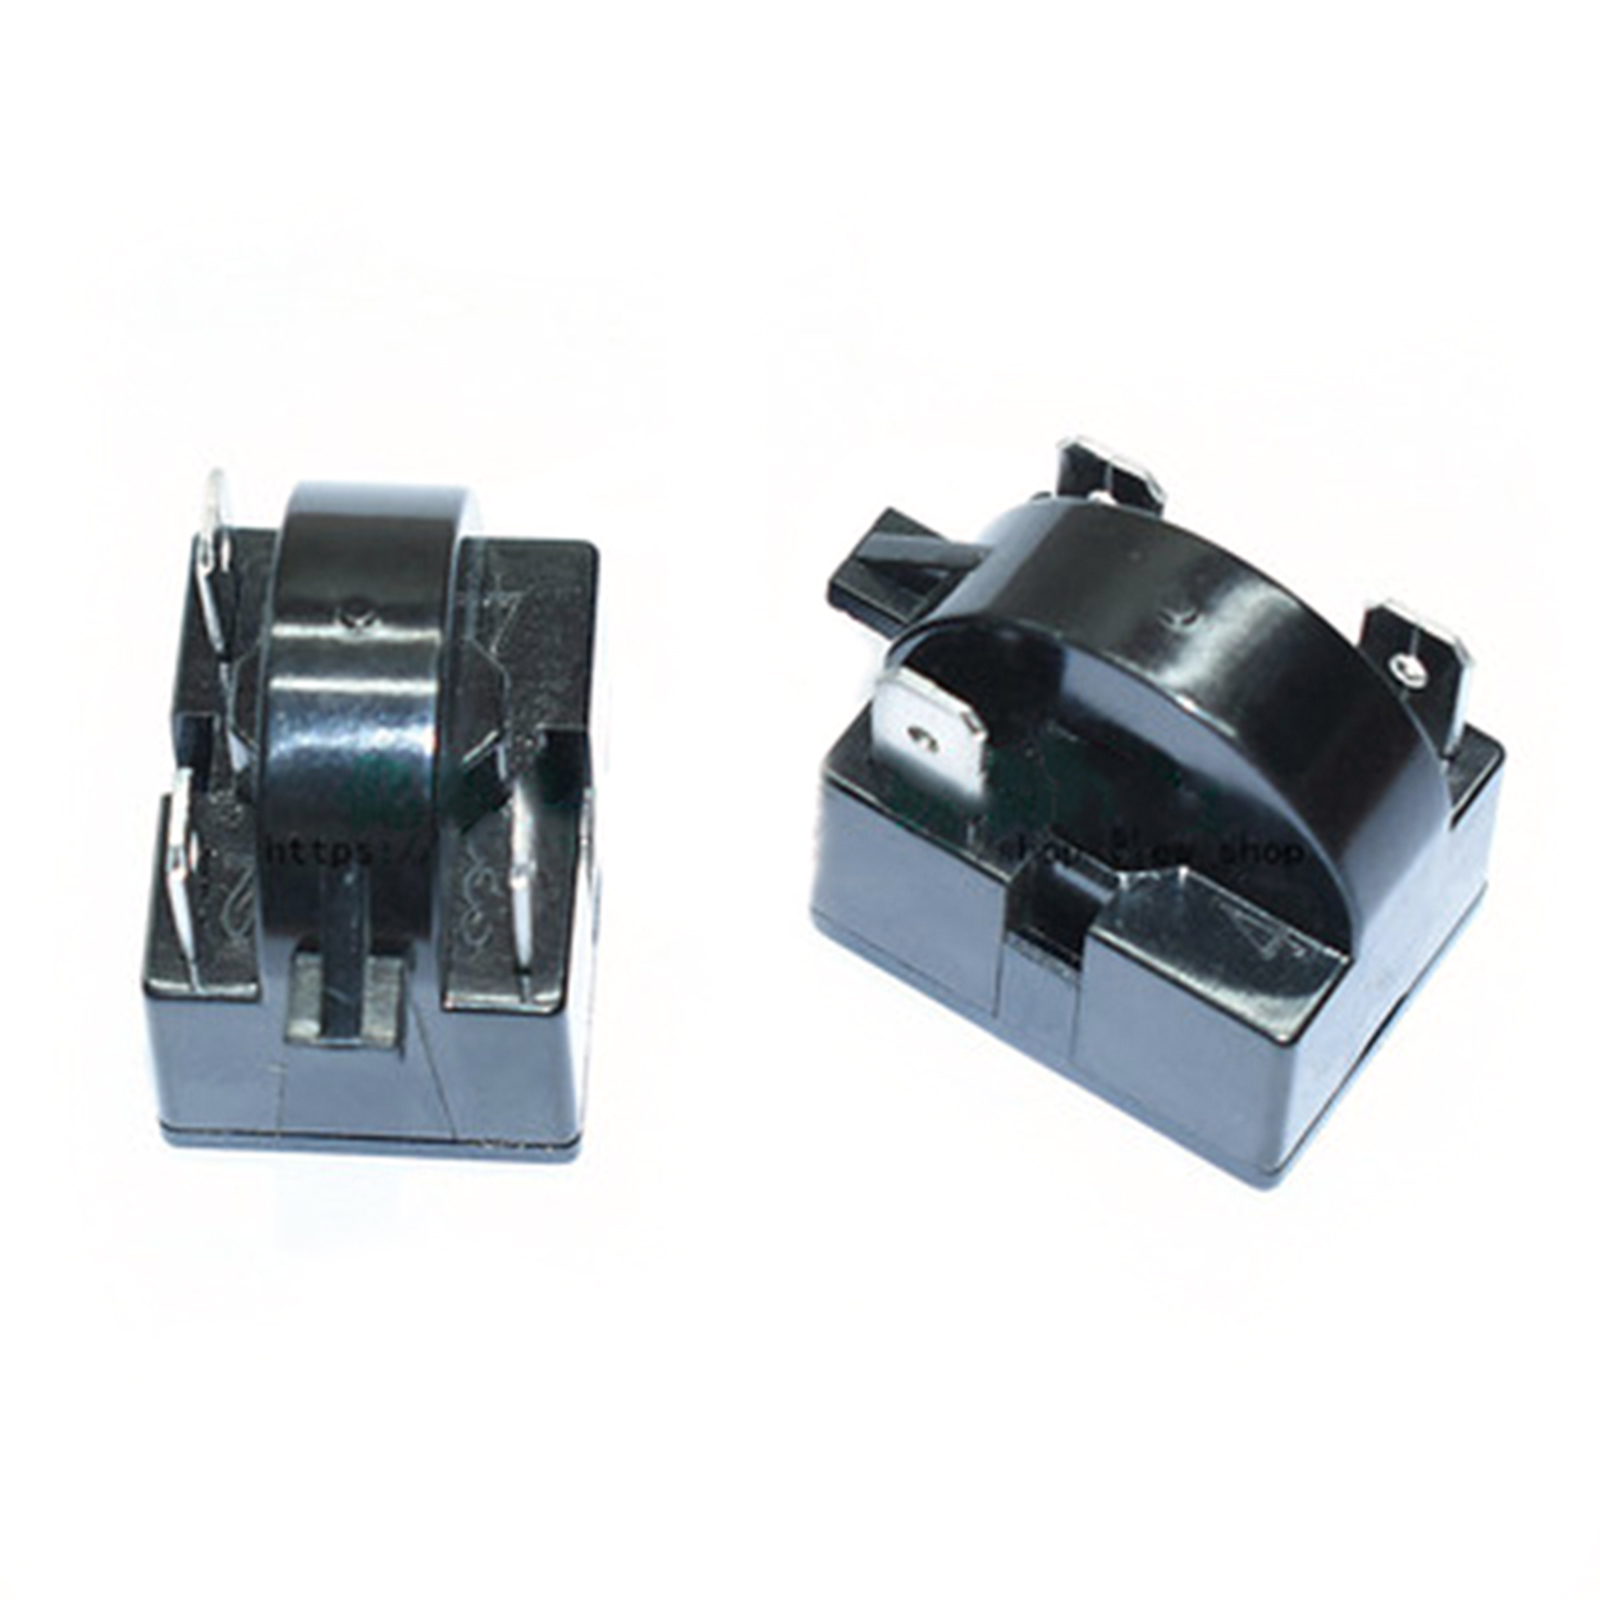 1PC Refrigerator Compressor Relay Starter For QP2-15C Universal Type Three Inserts 15 Ohm Refrigerator Parts